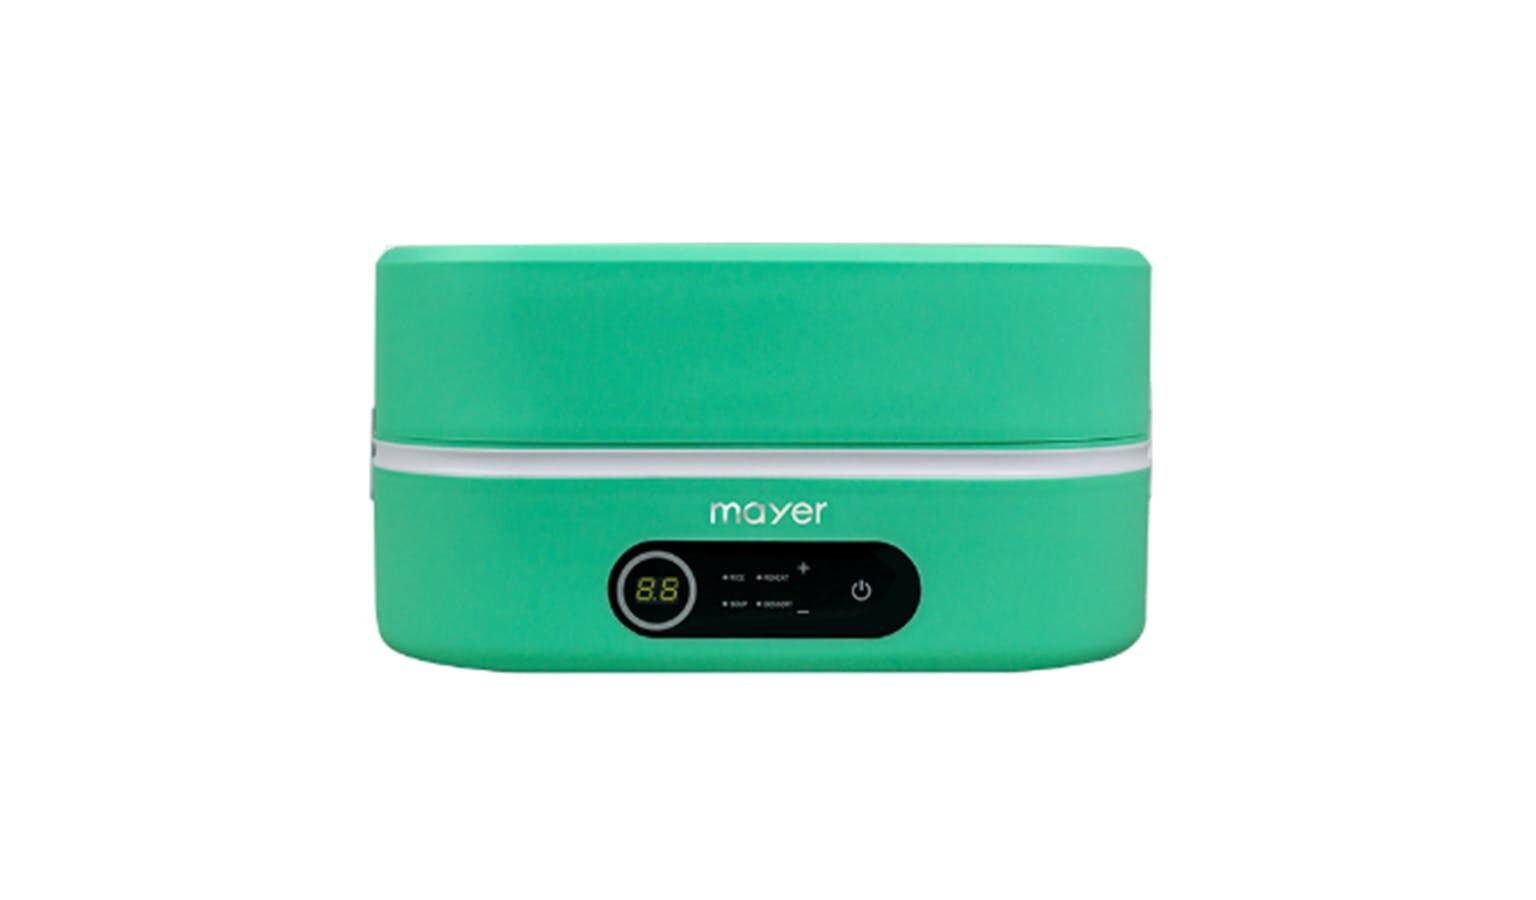 Mayer Digital Multi-Cooker Lunch Box (Mint/Pink)